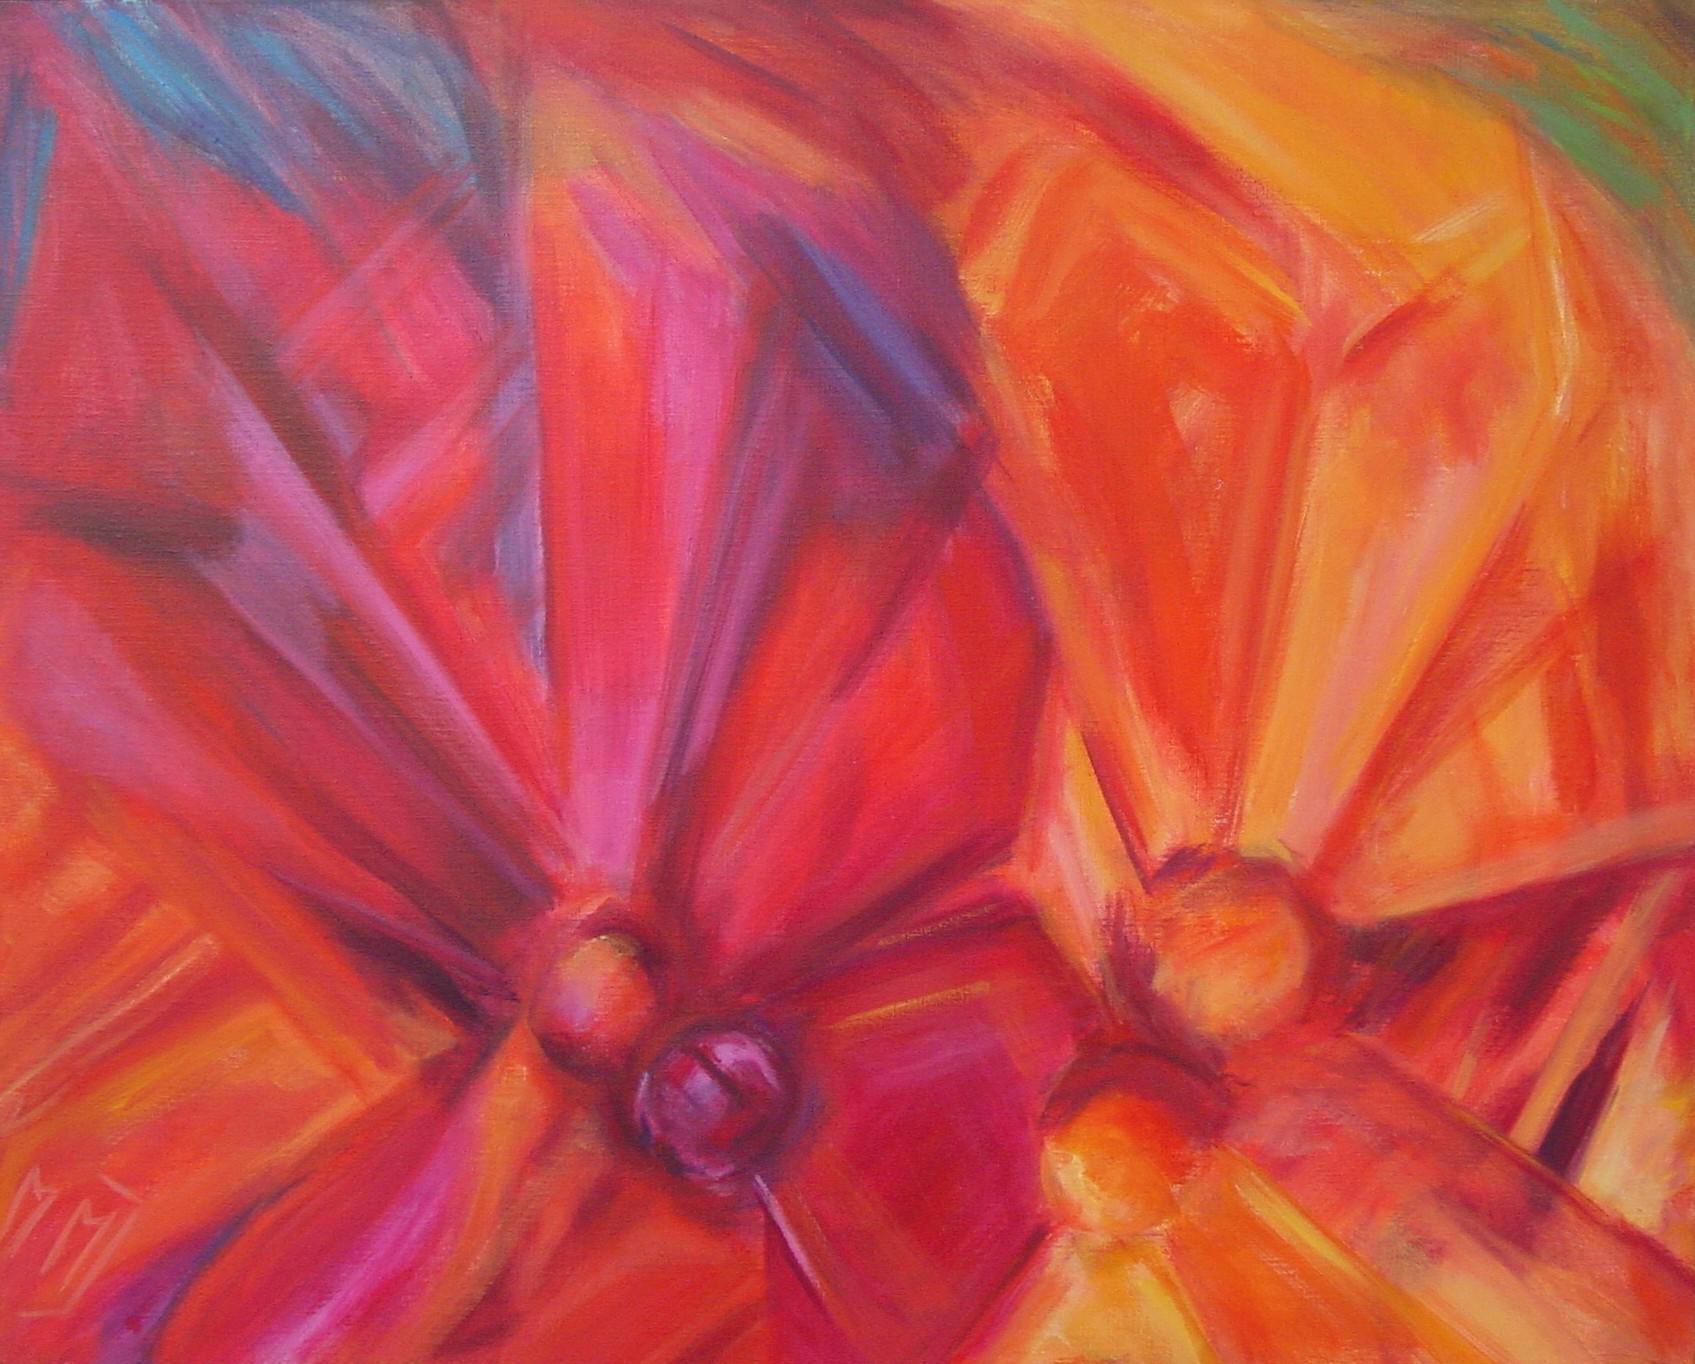 Red Poem, acryl op linnen, 80 x 100 cm, 2002